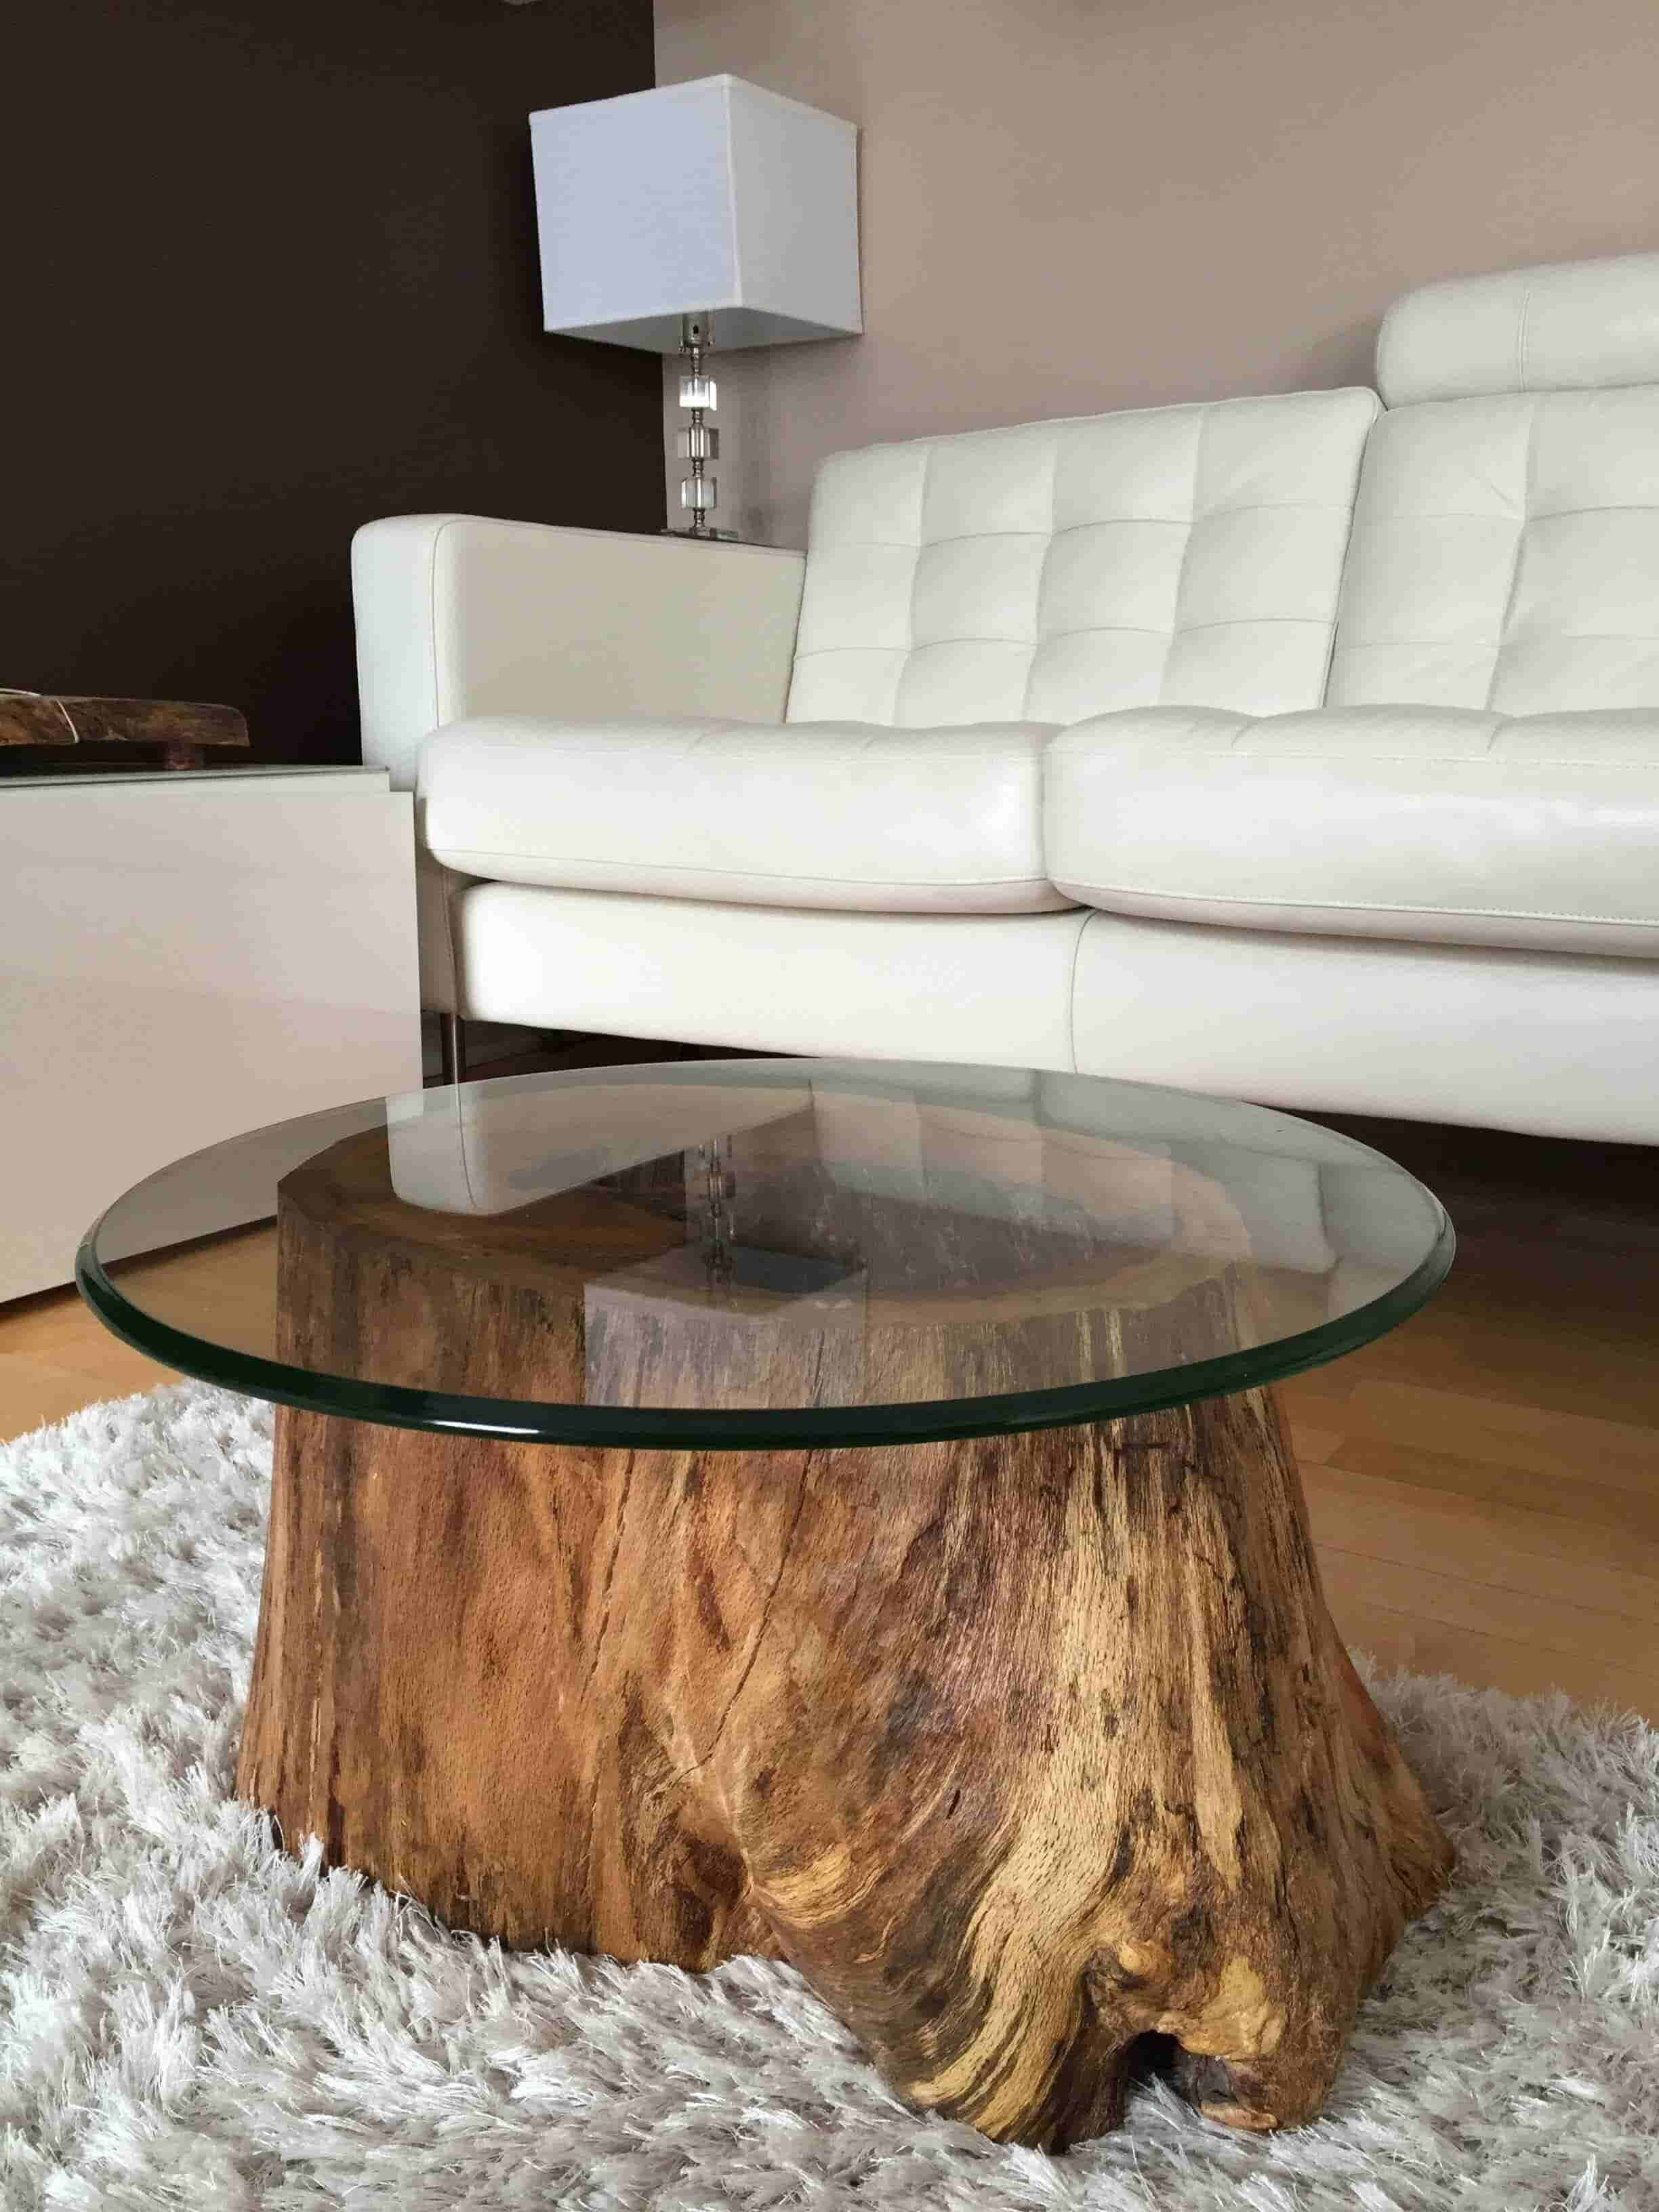 Modern Tree Stump Side Table Design Ideas Live Enhanced Coffee Table Rustic Furniture Coffee Table Wood [ 3264 x 2448 Pixel ]